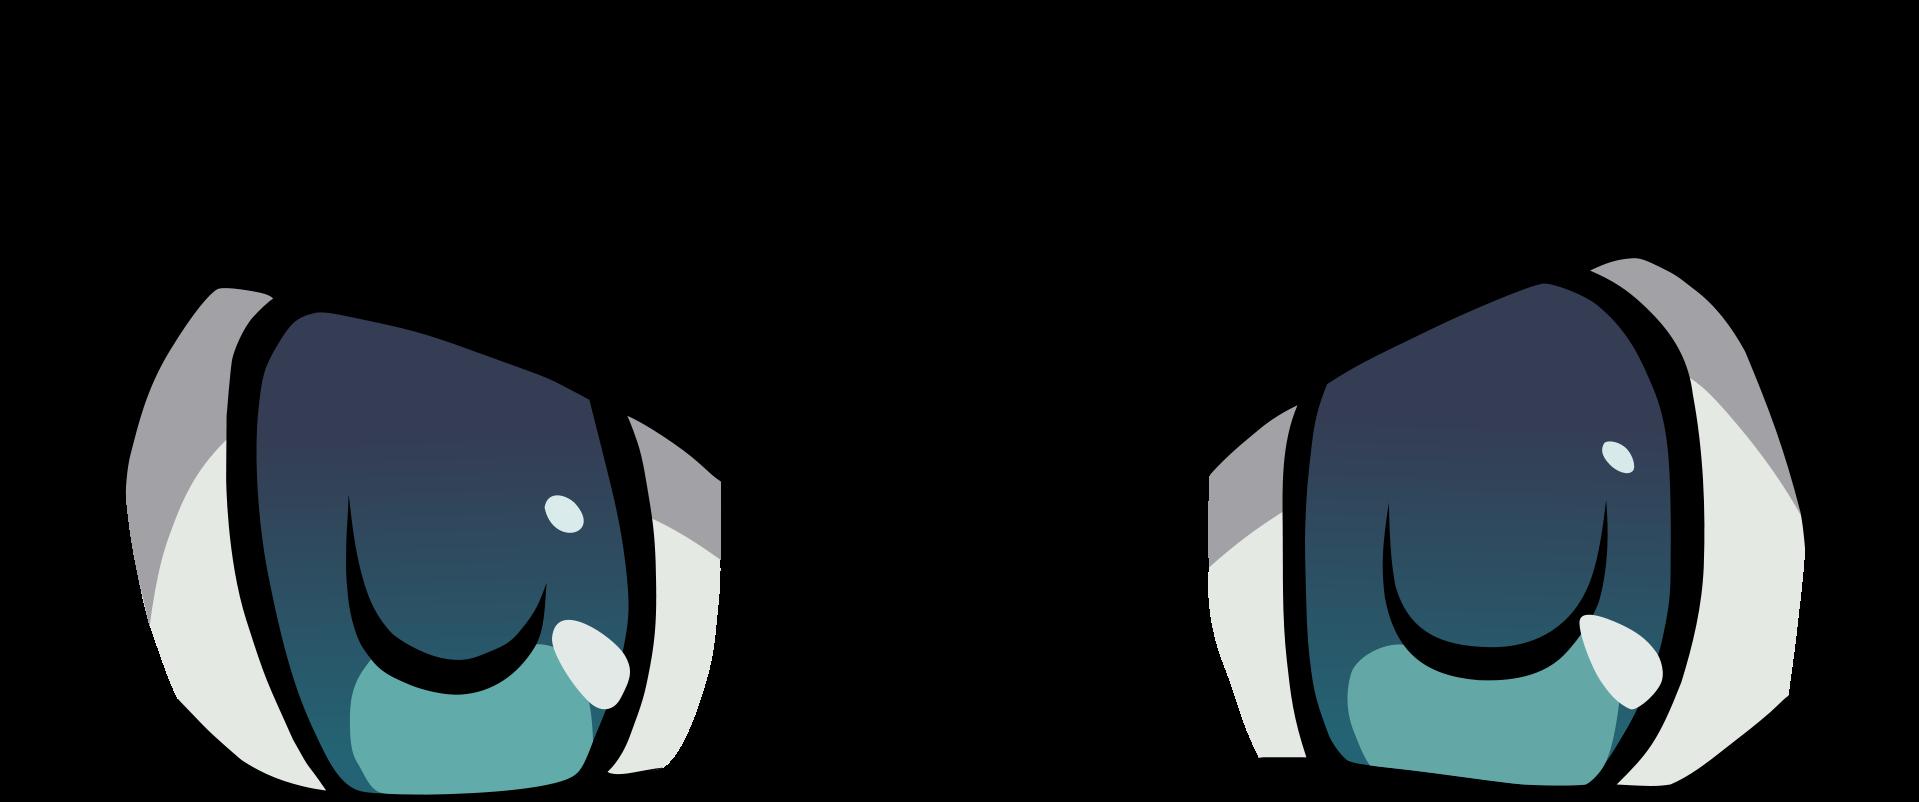 HD Eyes Png Transparent.